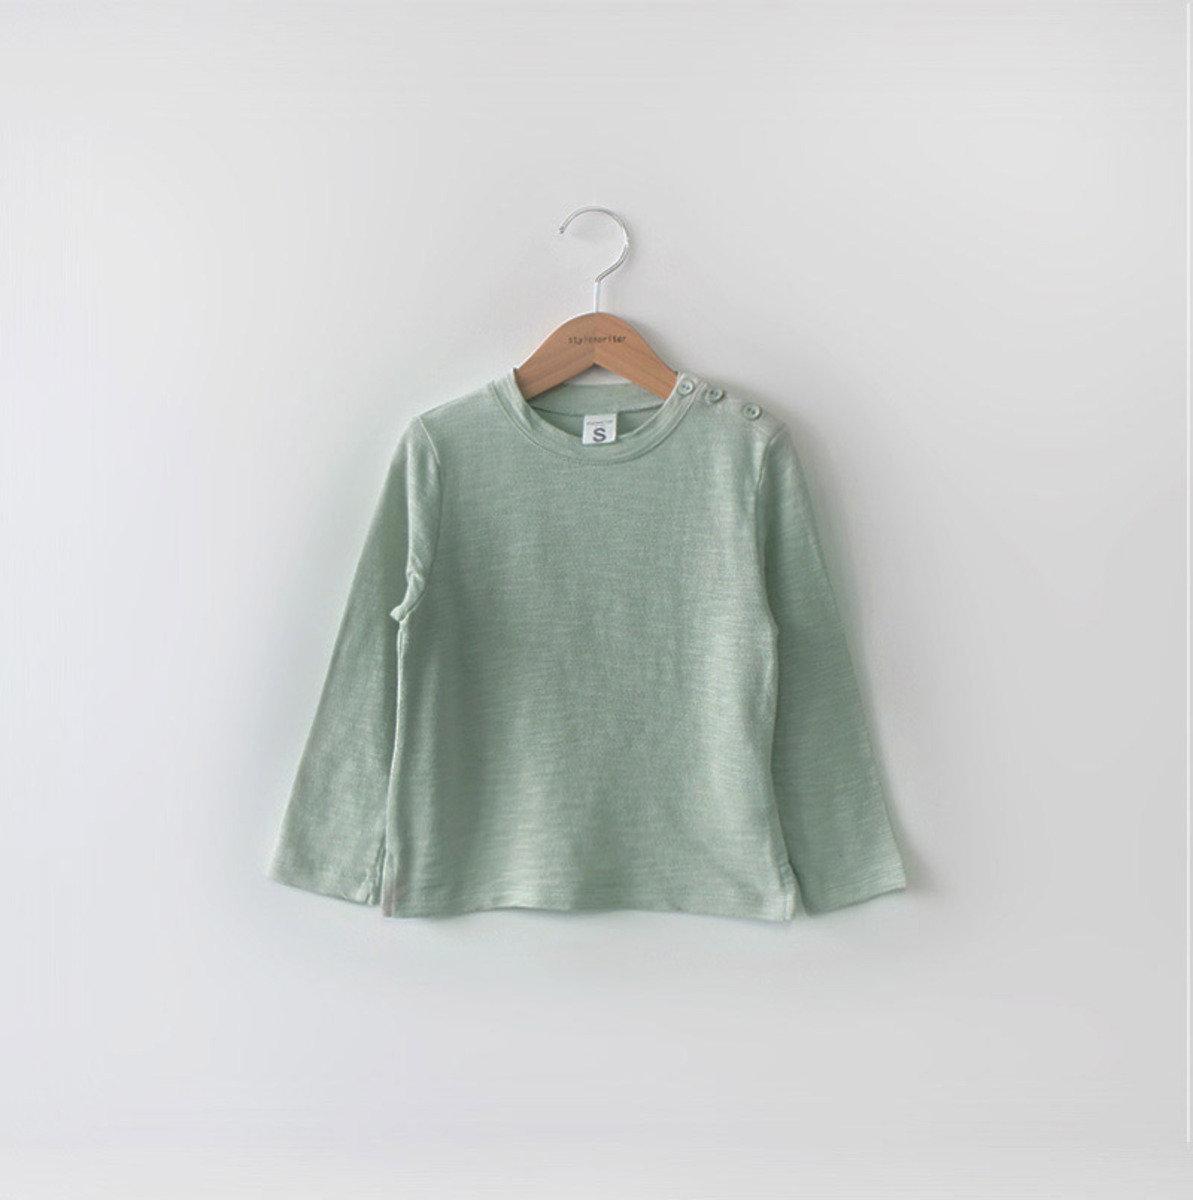 [16 SP] 膊扣鈕款T恤(中性)_S64237